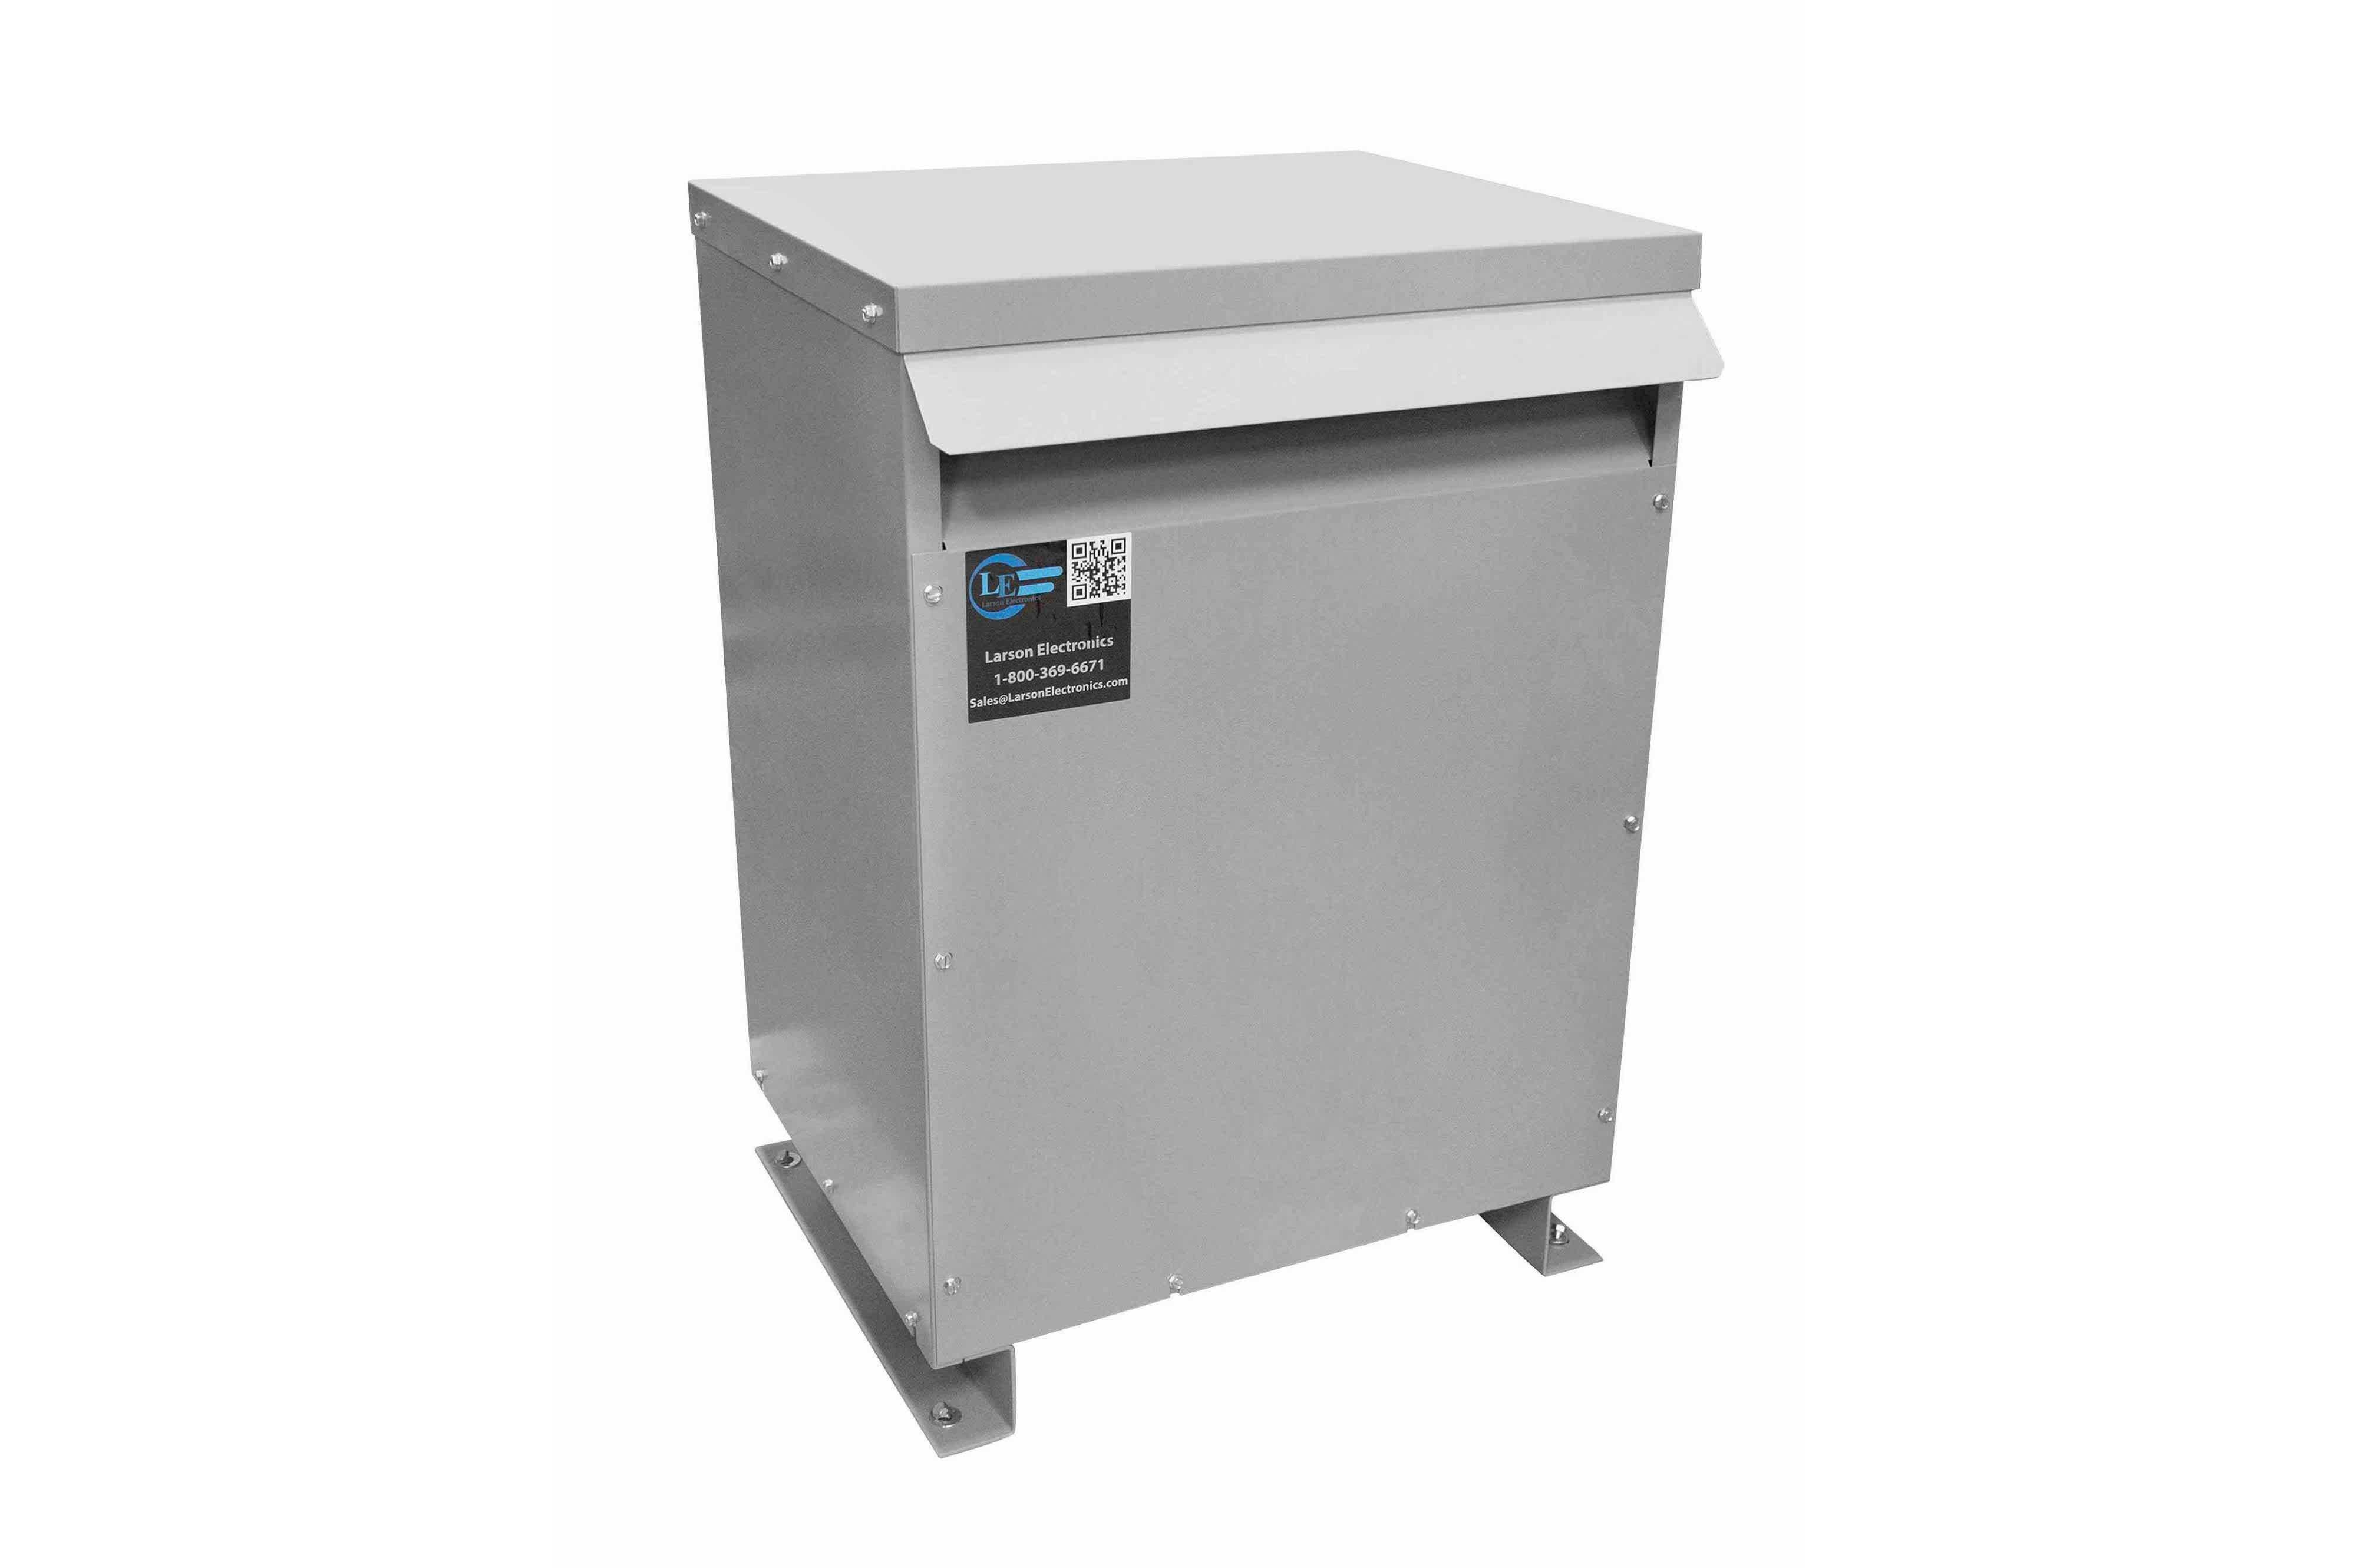 237.5 kVA 3PH Isolation Transformer, 415V Wye Primary, 480Y/277 Wye-N Secondary, N3R, Ventilated, 60 Hz